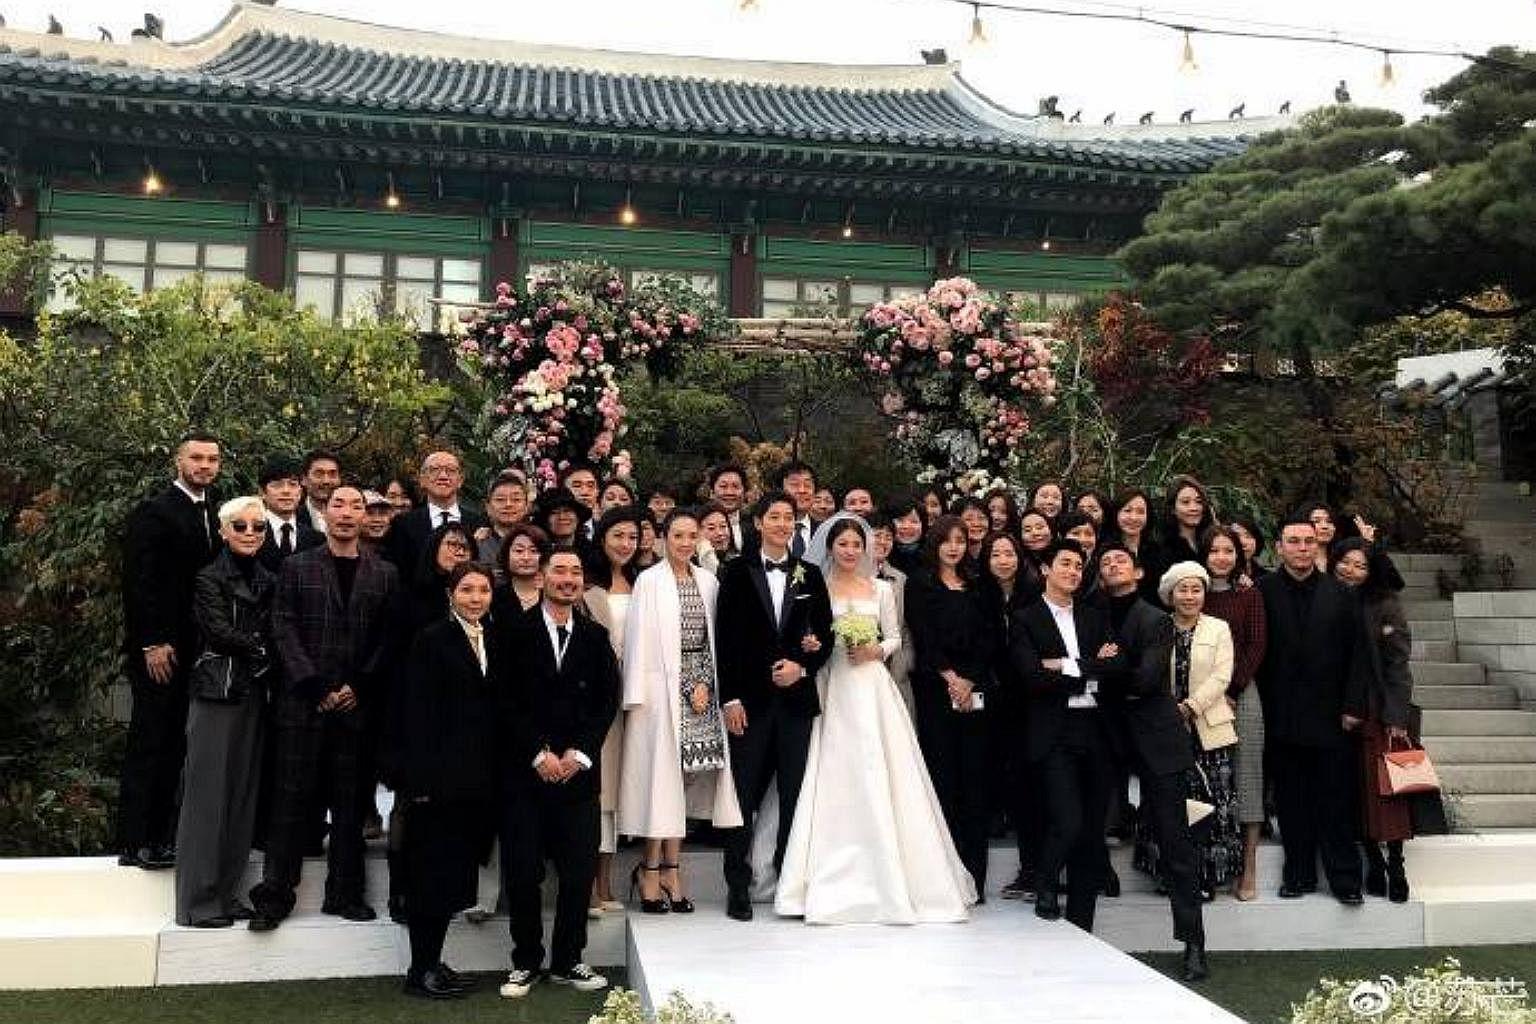 Descendants Of The Sun couple Song Hye Kyo and Song Joong Ki